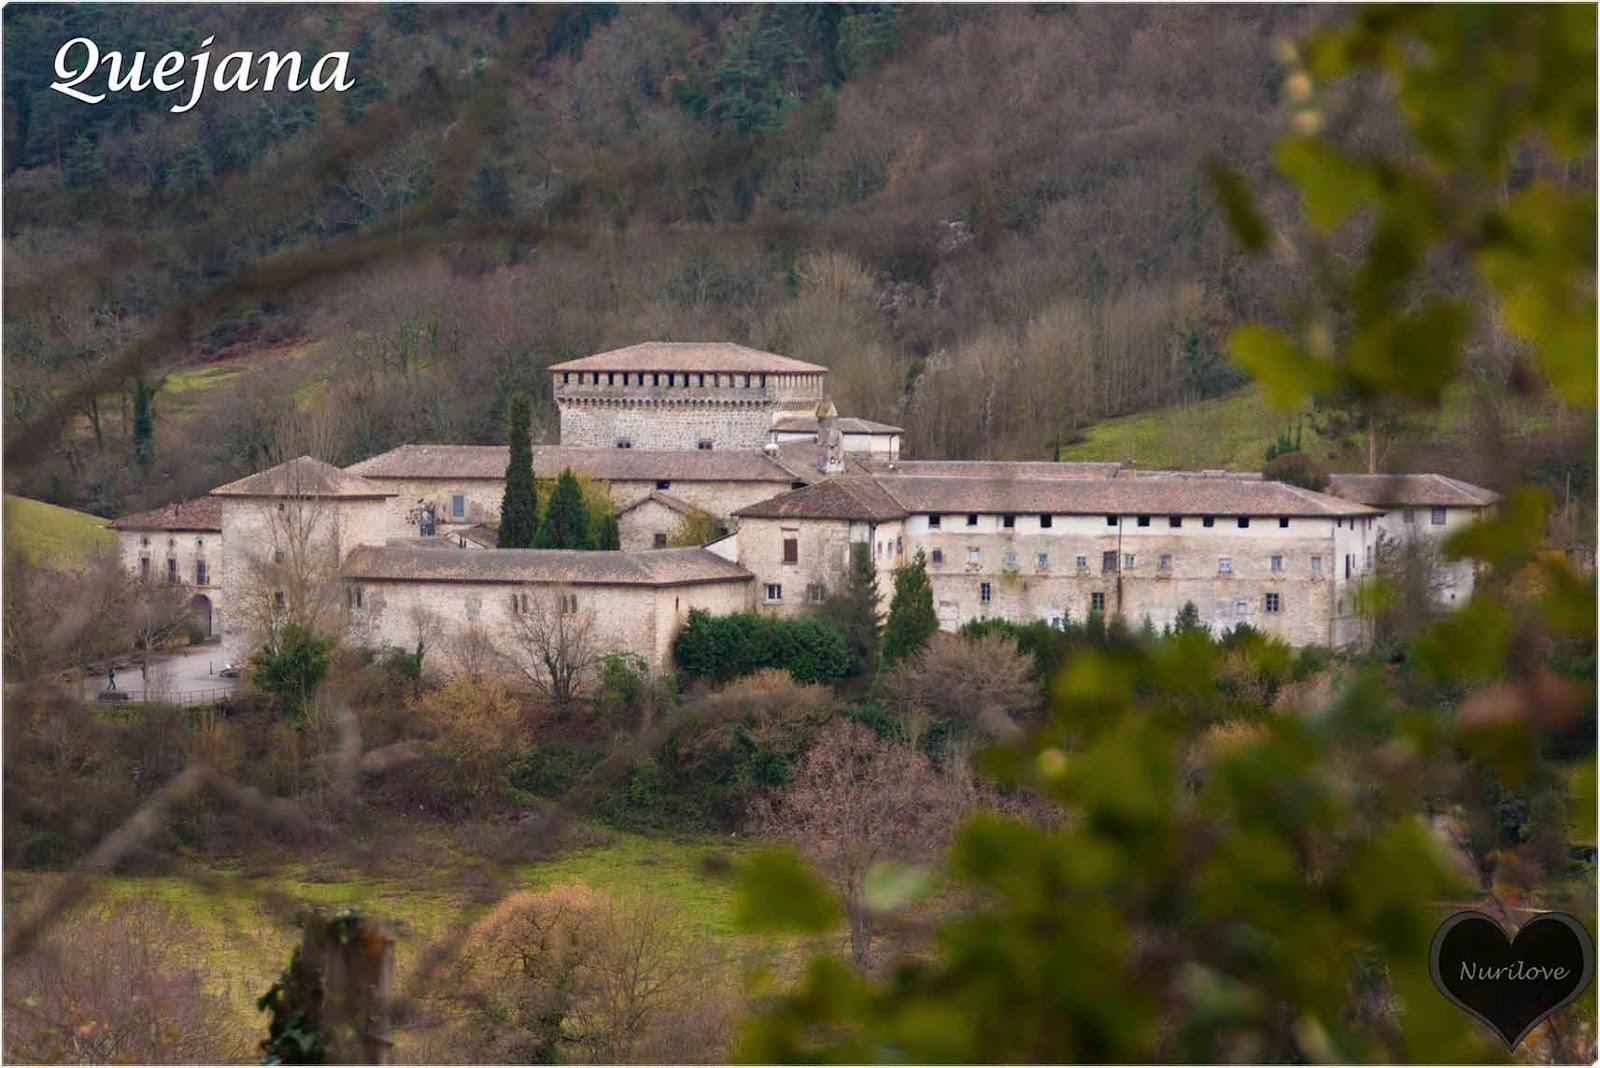 Quejana, un lugar cerca de Bilbao donde pasar un agradable día de excursión